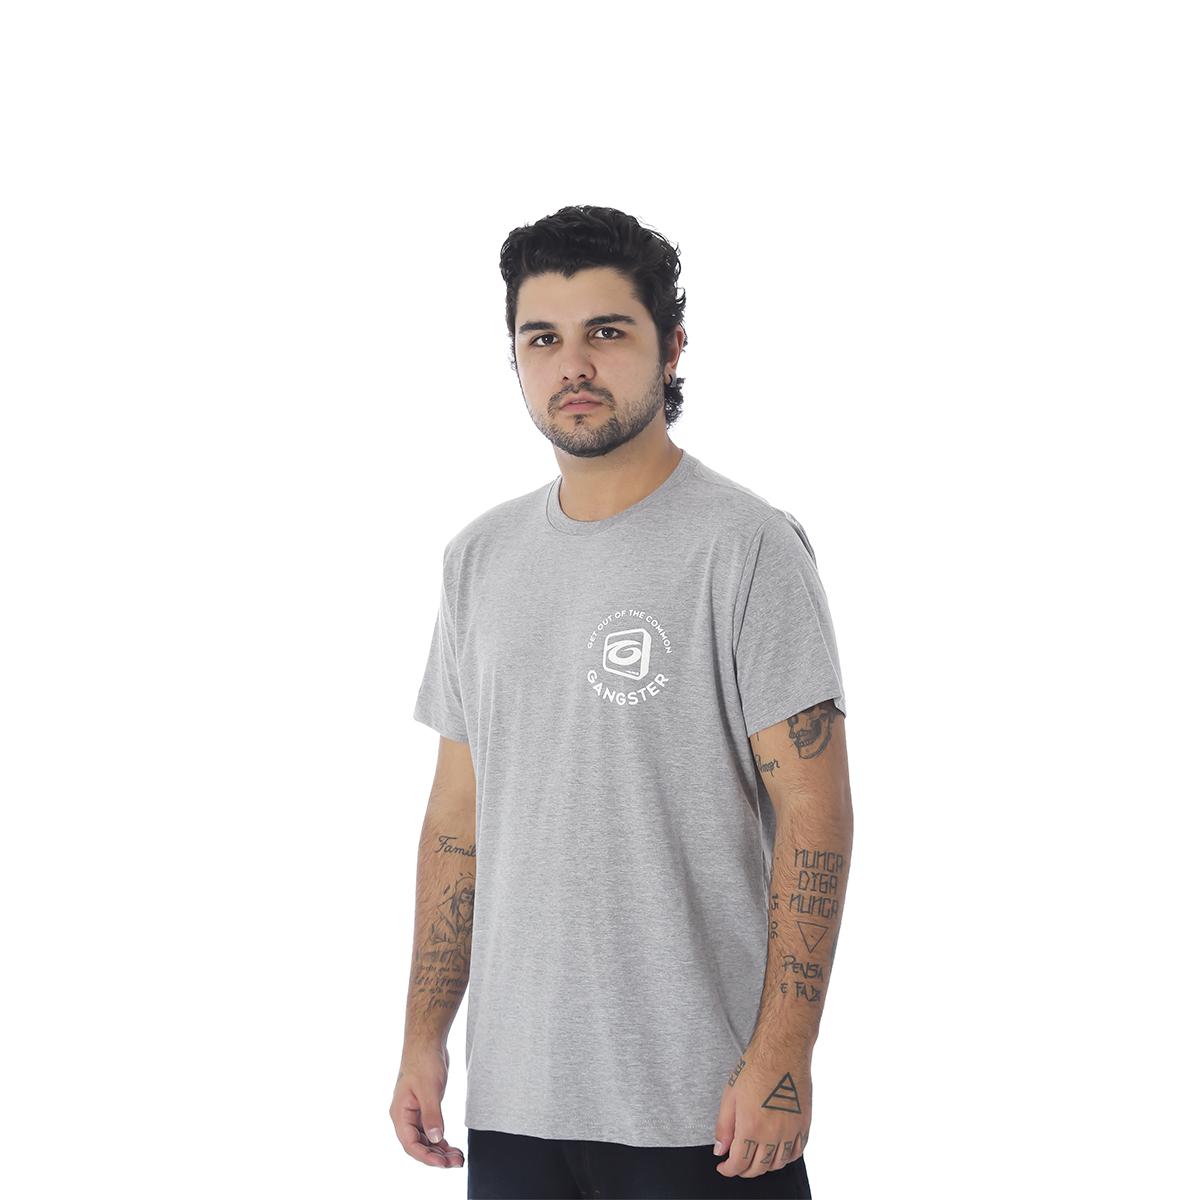 Camiseta Masculina Estampada Gangster 10.01.9989